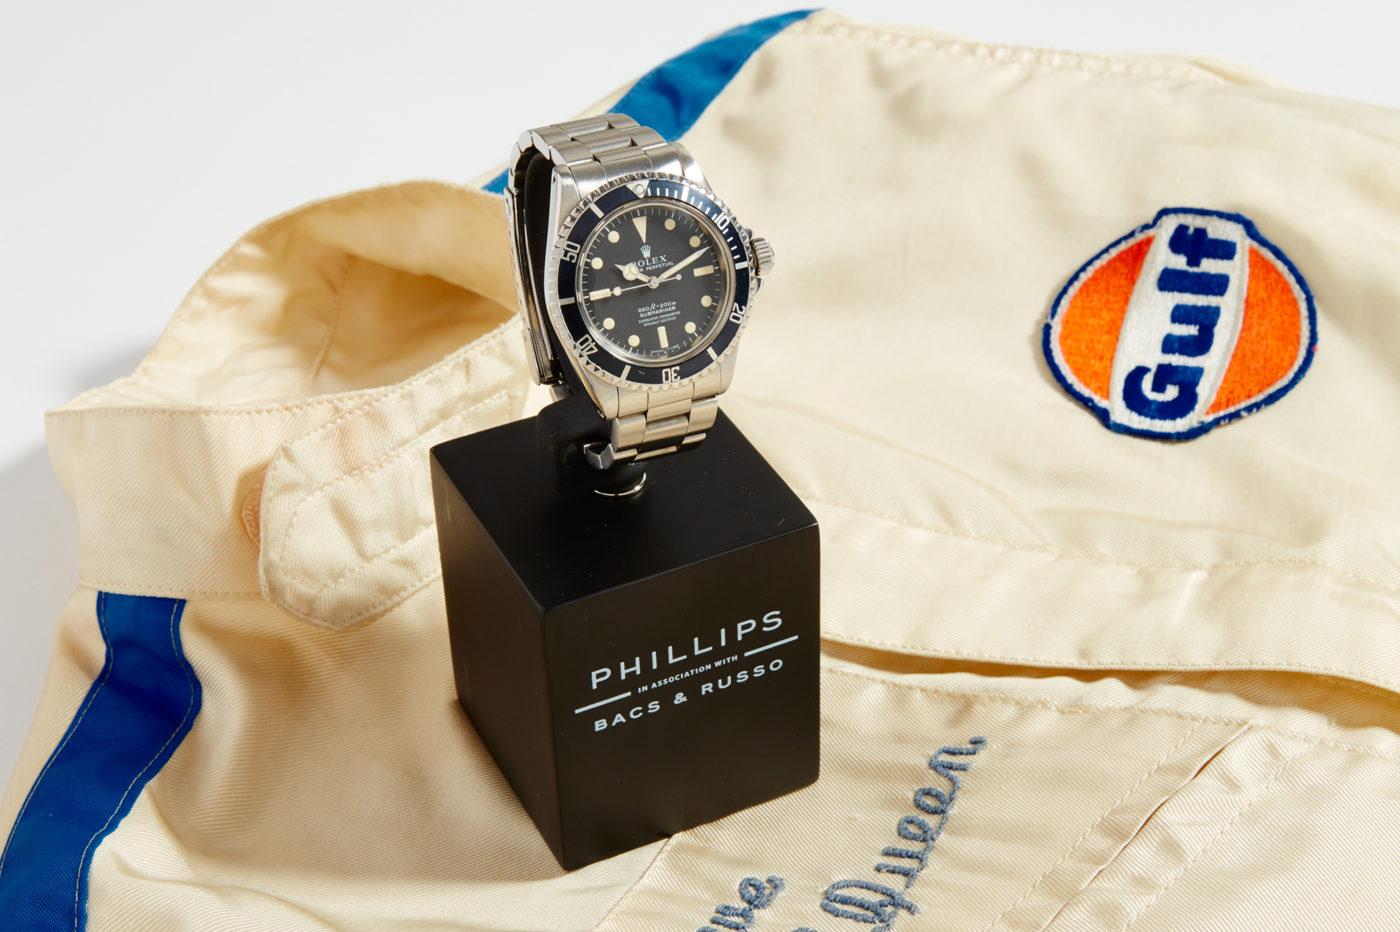 Aukcje Rolex Submariner Steve'a McQueena trafi pod młotek